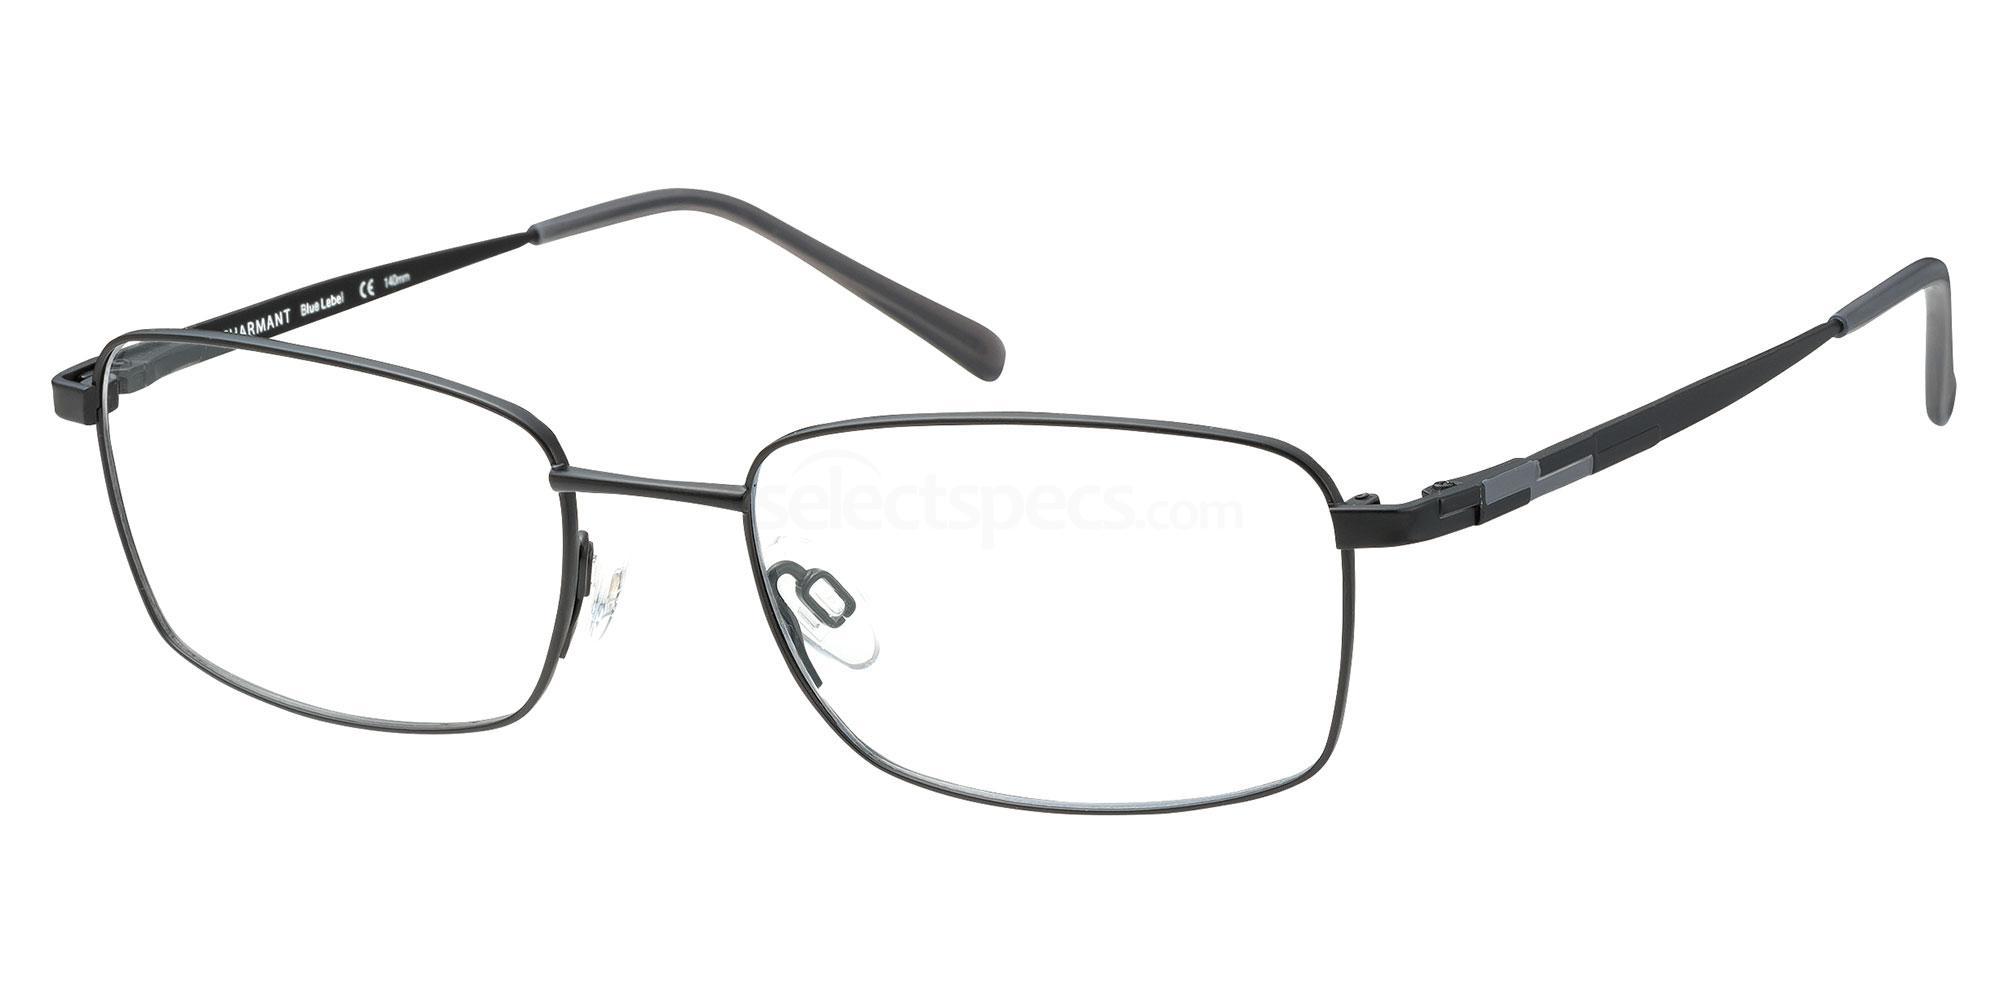 BK CH16122 Glasses, Charmant Blue Label